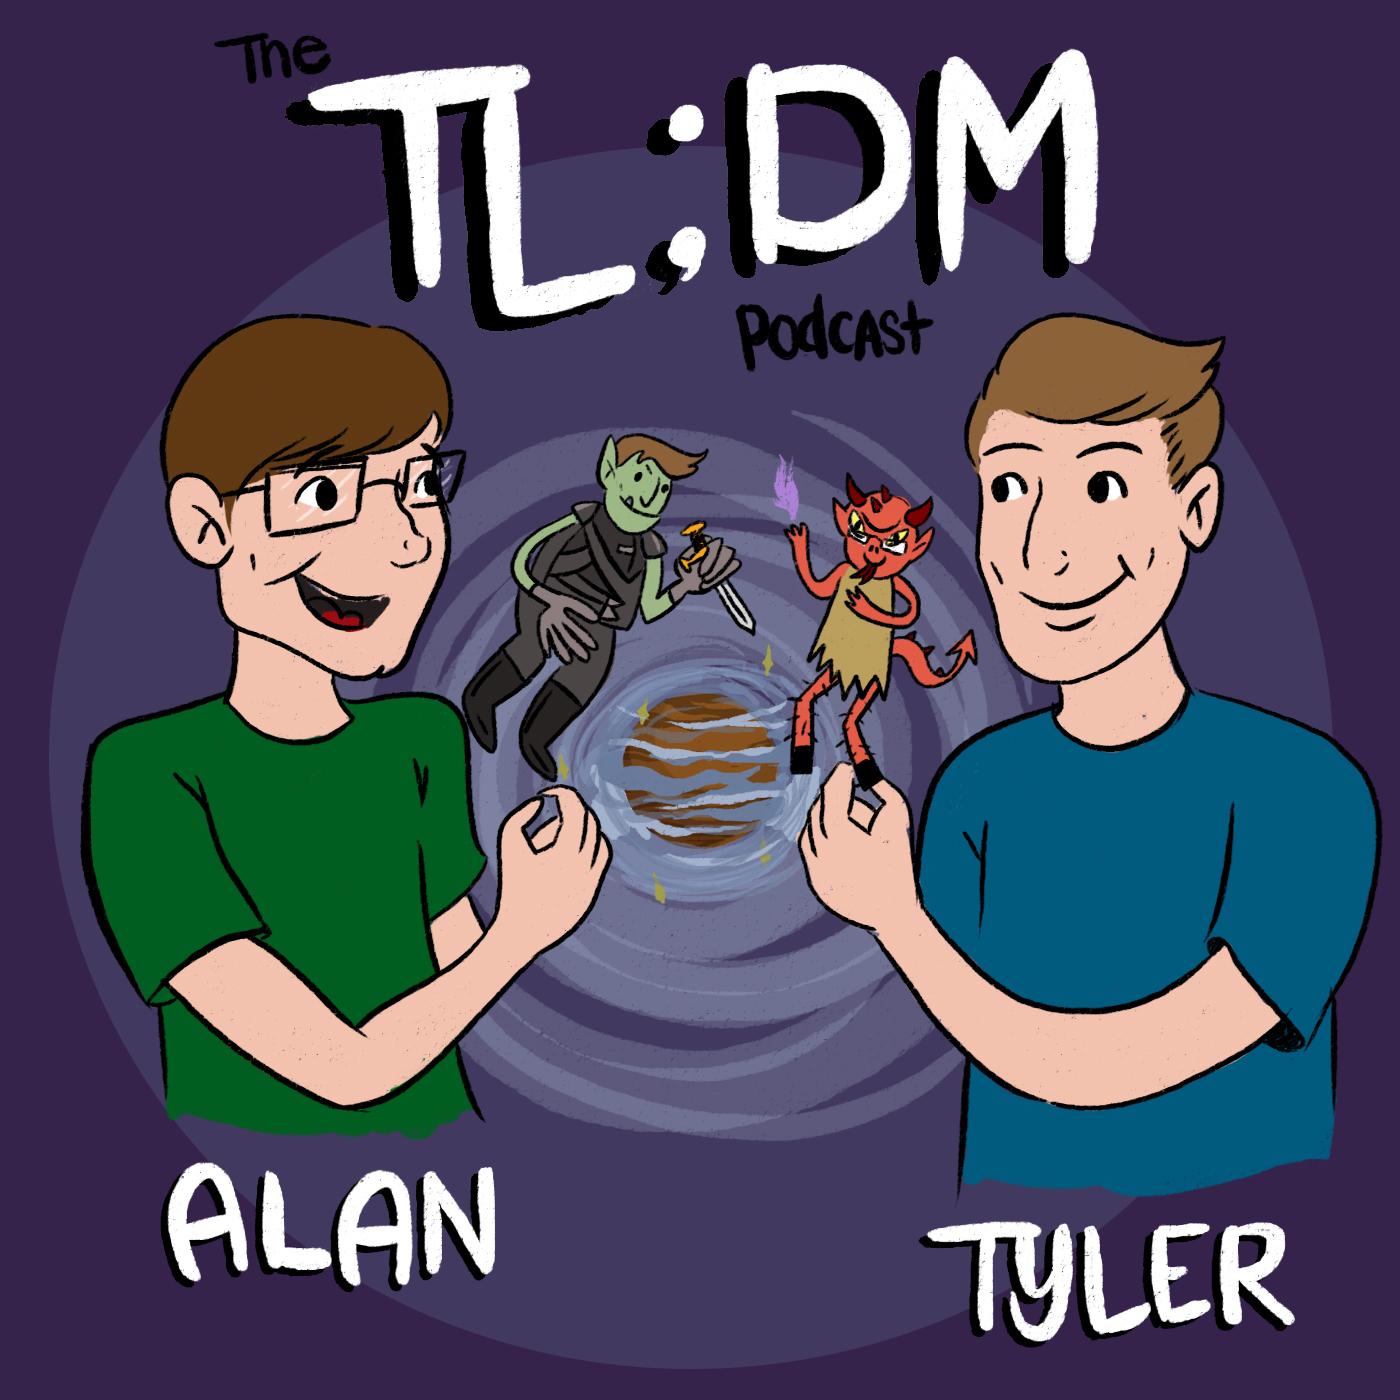 tl;dm - A D&D DM Podcast show art